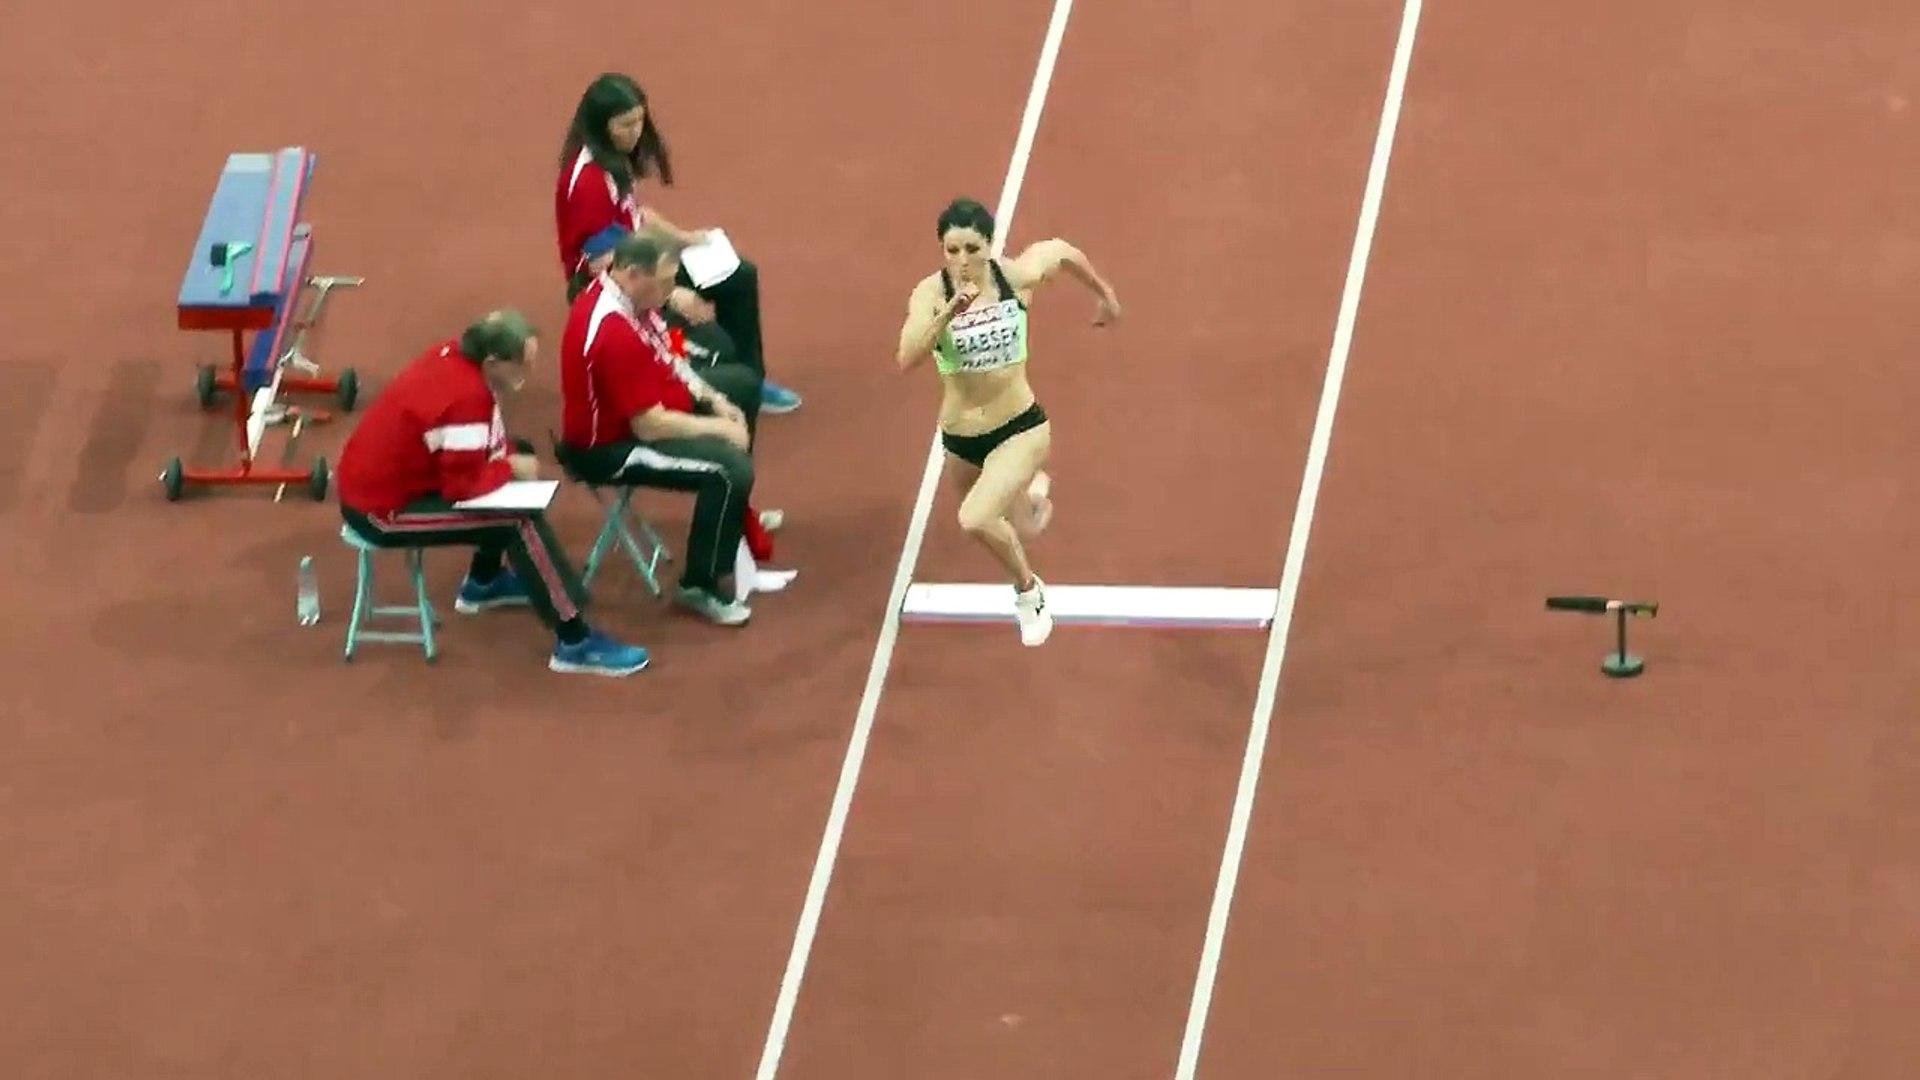 Saša Babšek 2015, Slovenian female athletes always great